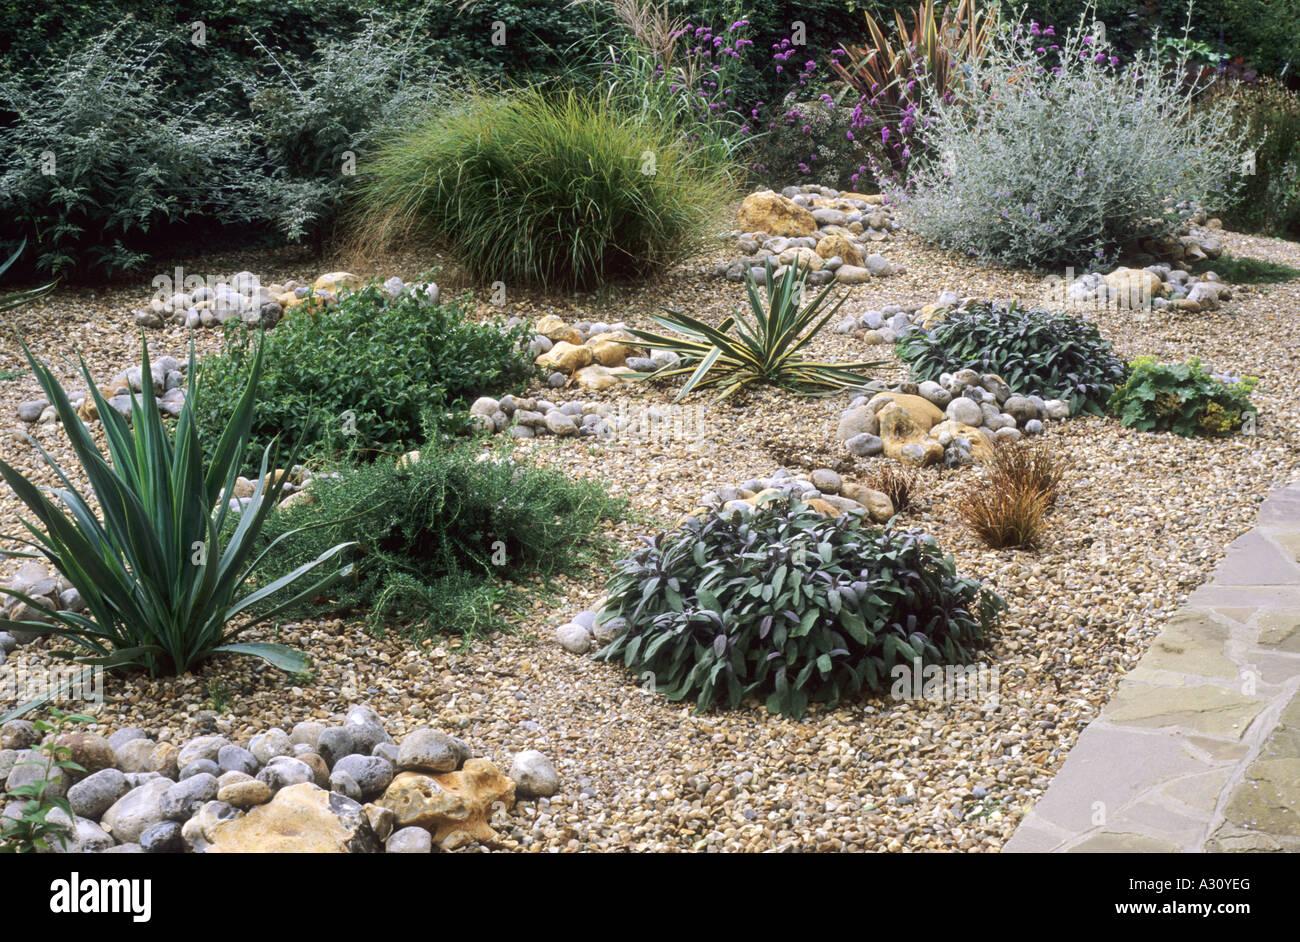 Gravel Garden grasses salvia drought tolerant plants dry